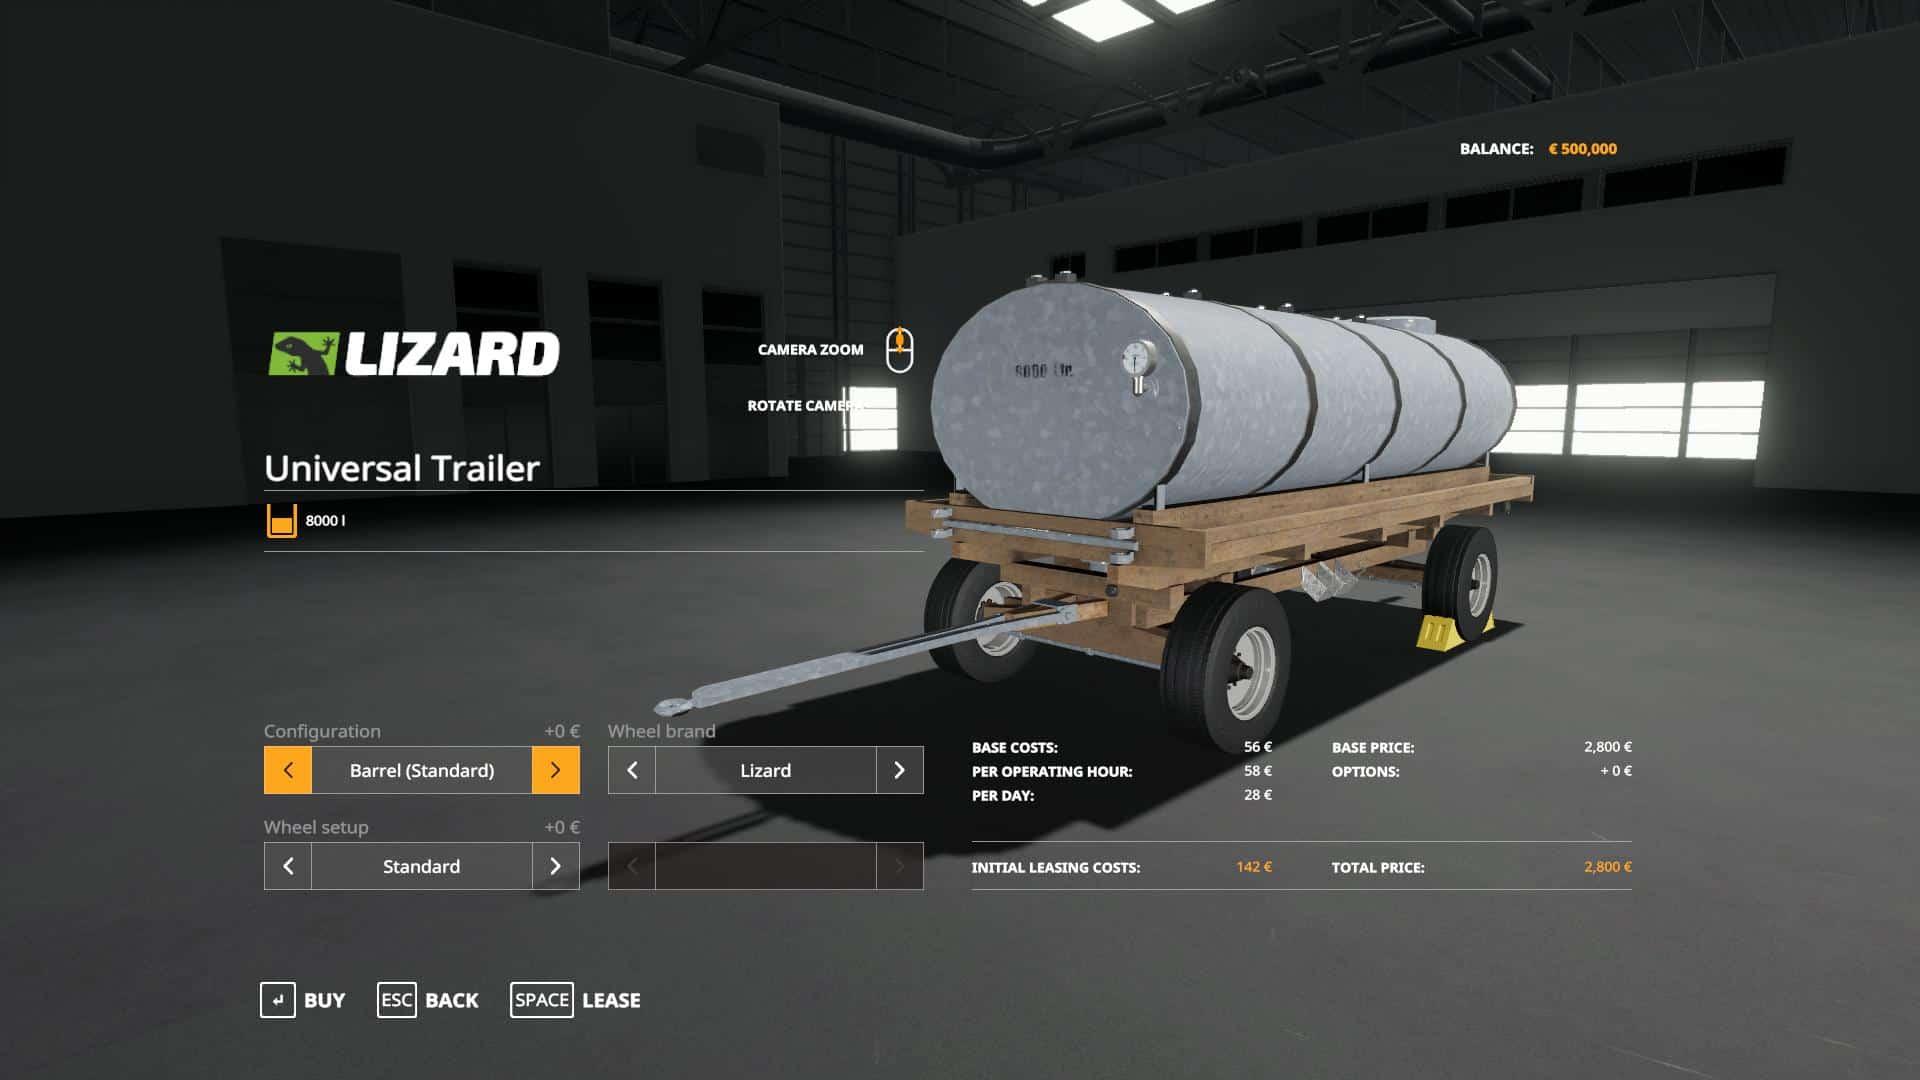 Lizard Universal Trailer v1 0 0 Mod - Farming Simulator 19